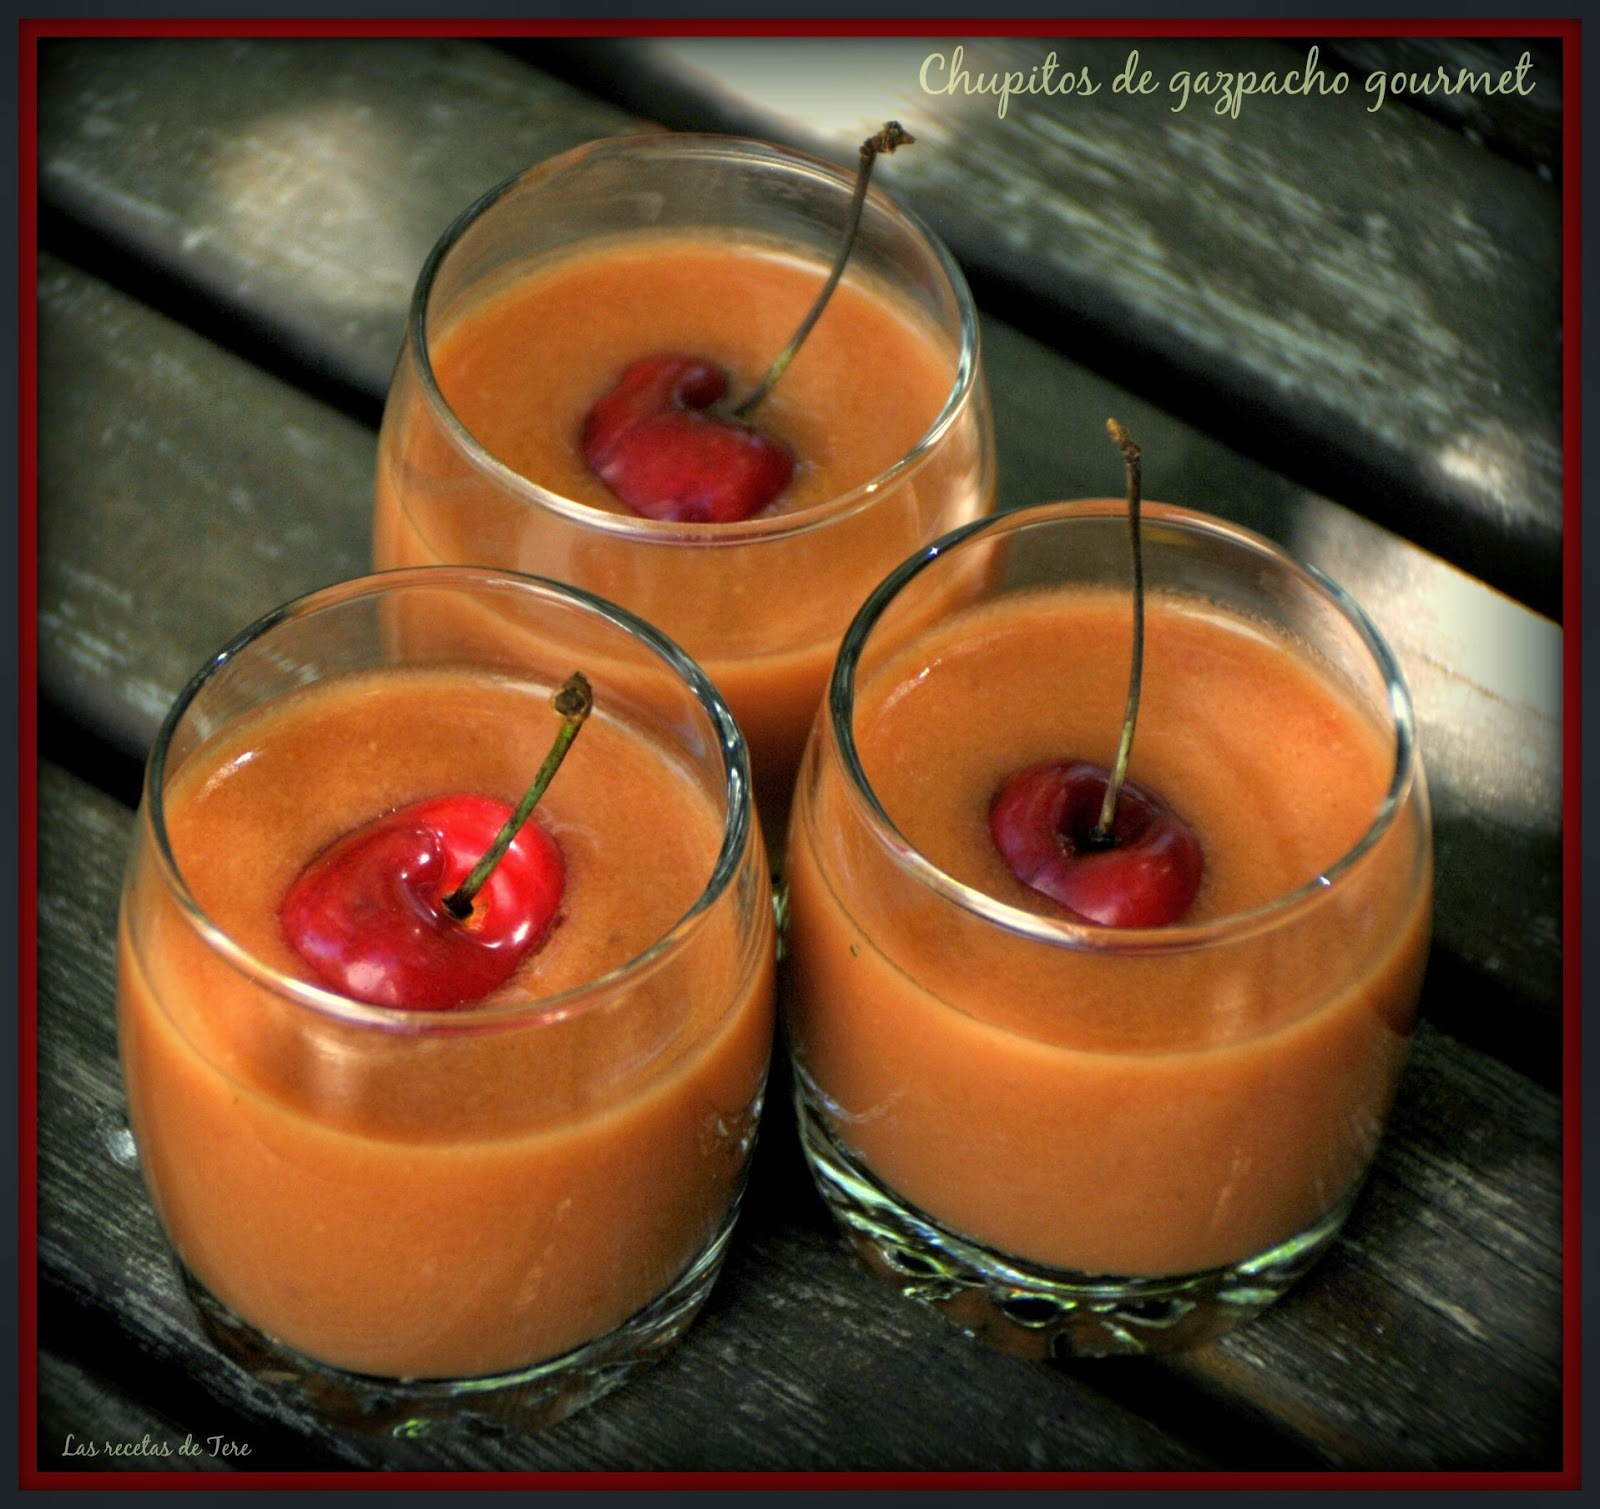 Chupitos de gazpacho gourmet.